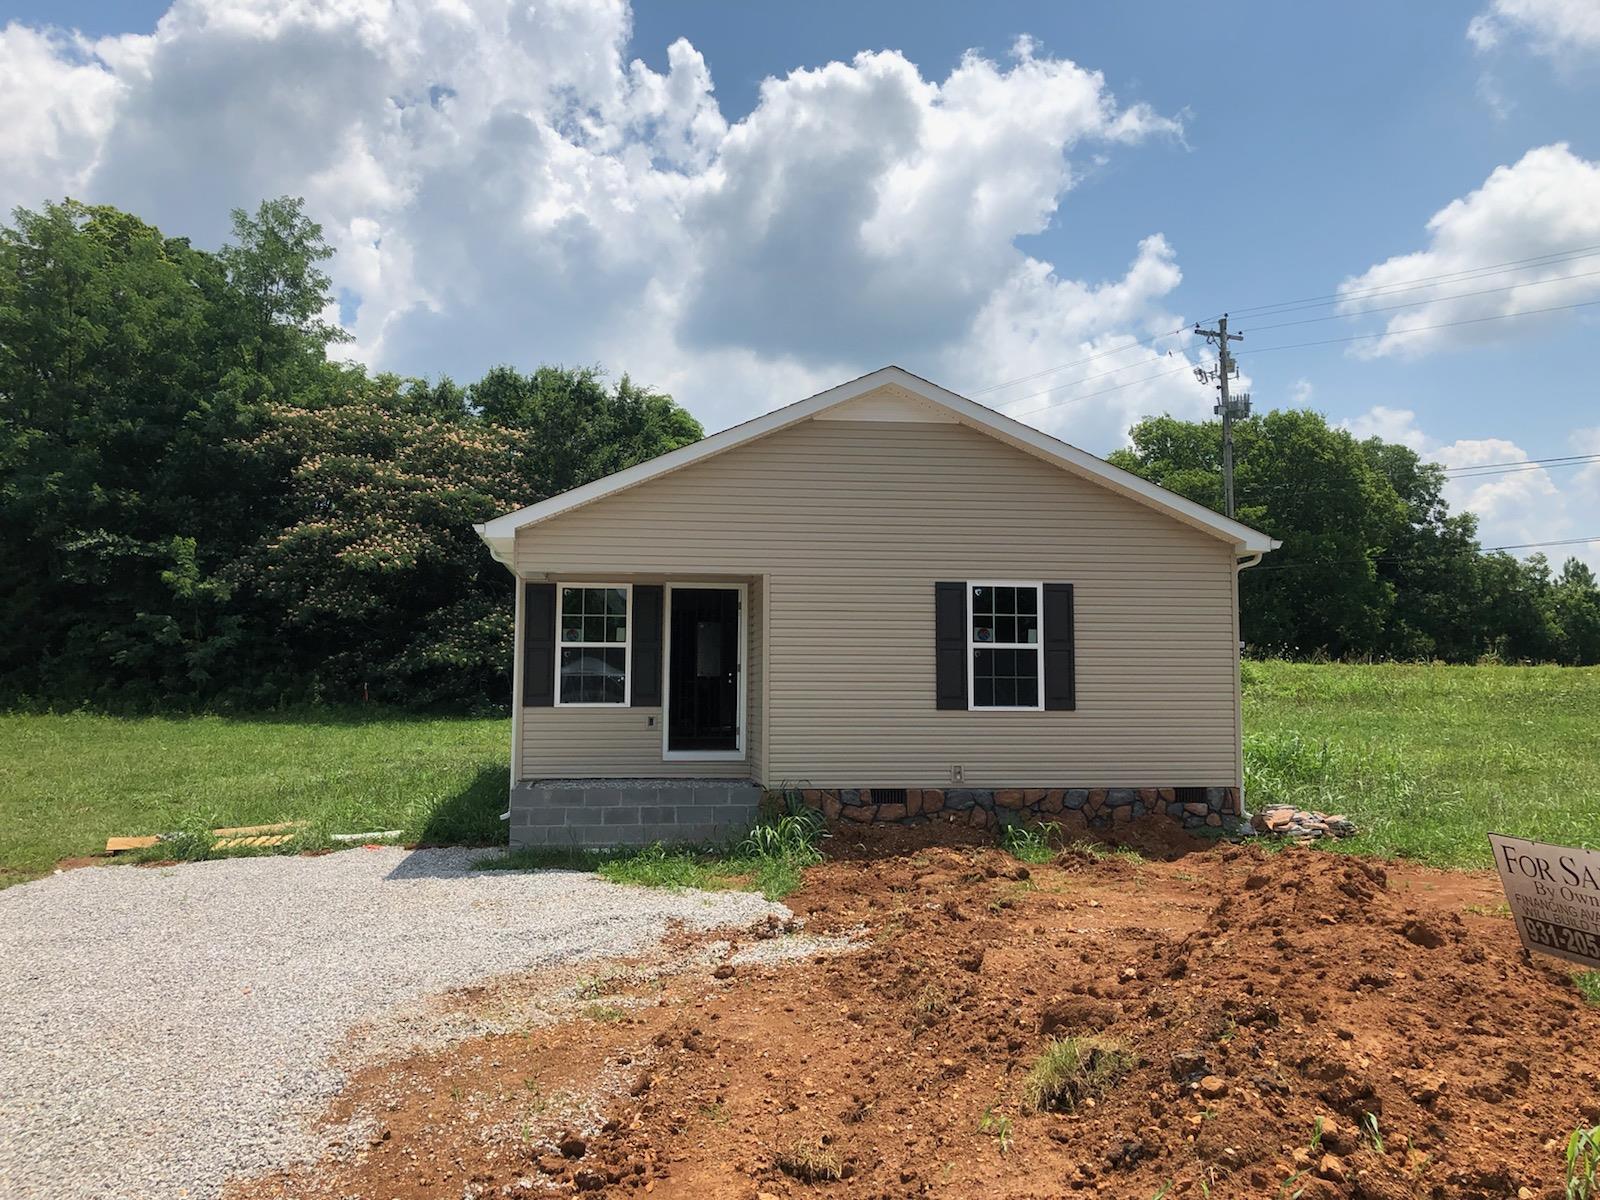 706 Garner St, Cowan, TN 37318 - Cowan, TN real estate listing